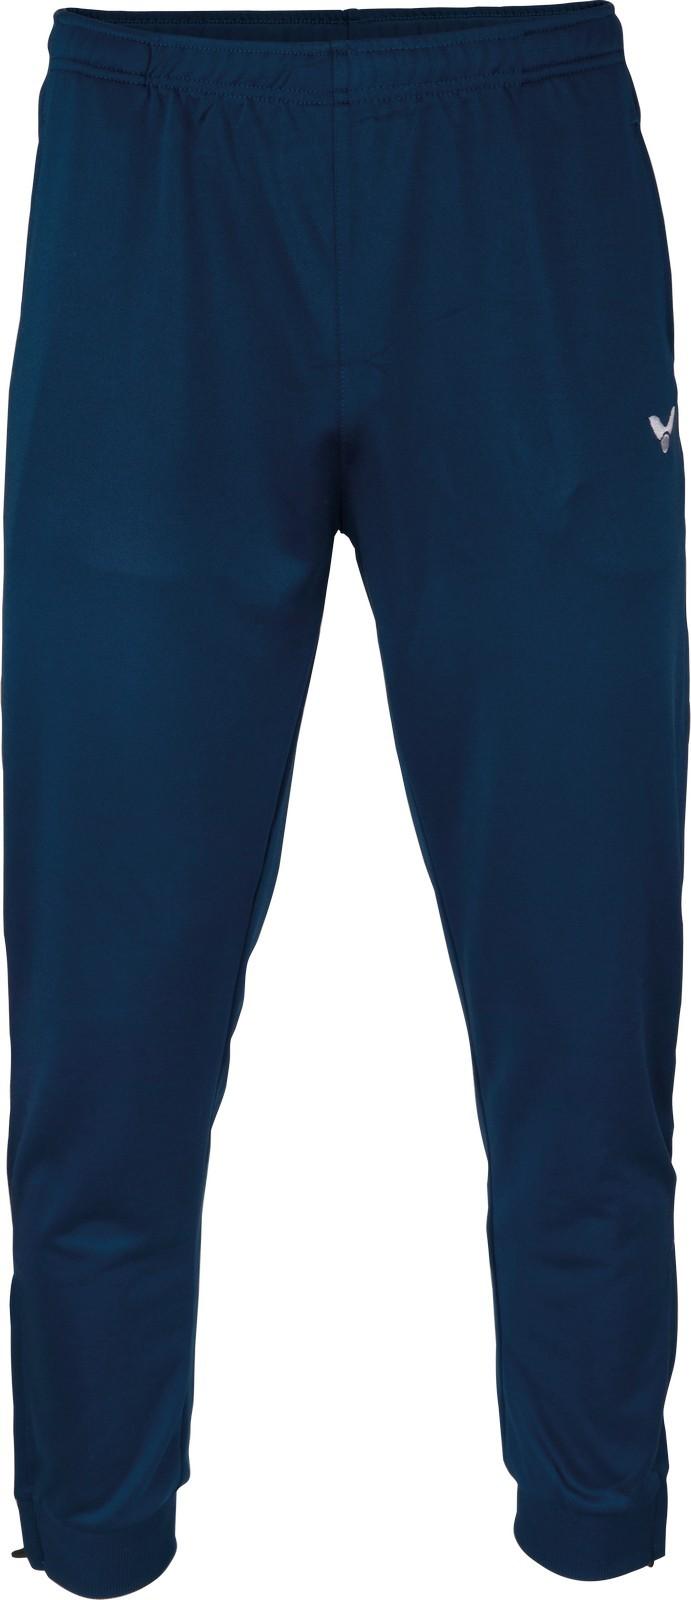 Victor TA Pants Team blue 3938